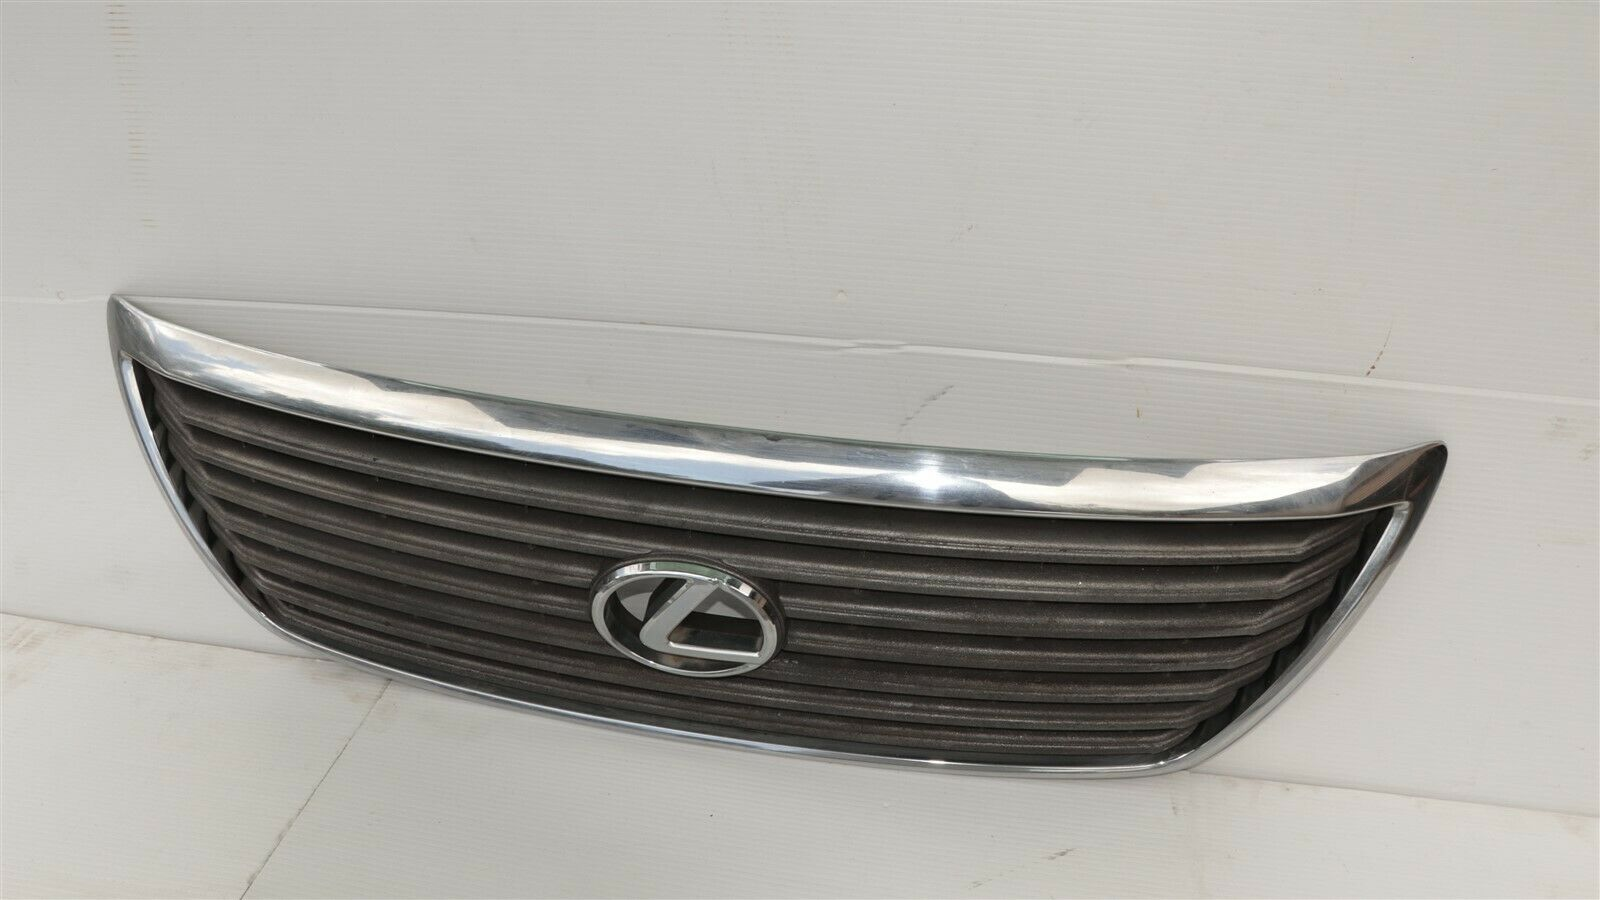 04-06 Lexus LS430 Upper Bumper Radiator Grill Grille W/Emblem Assembly